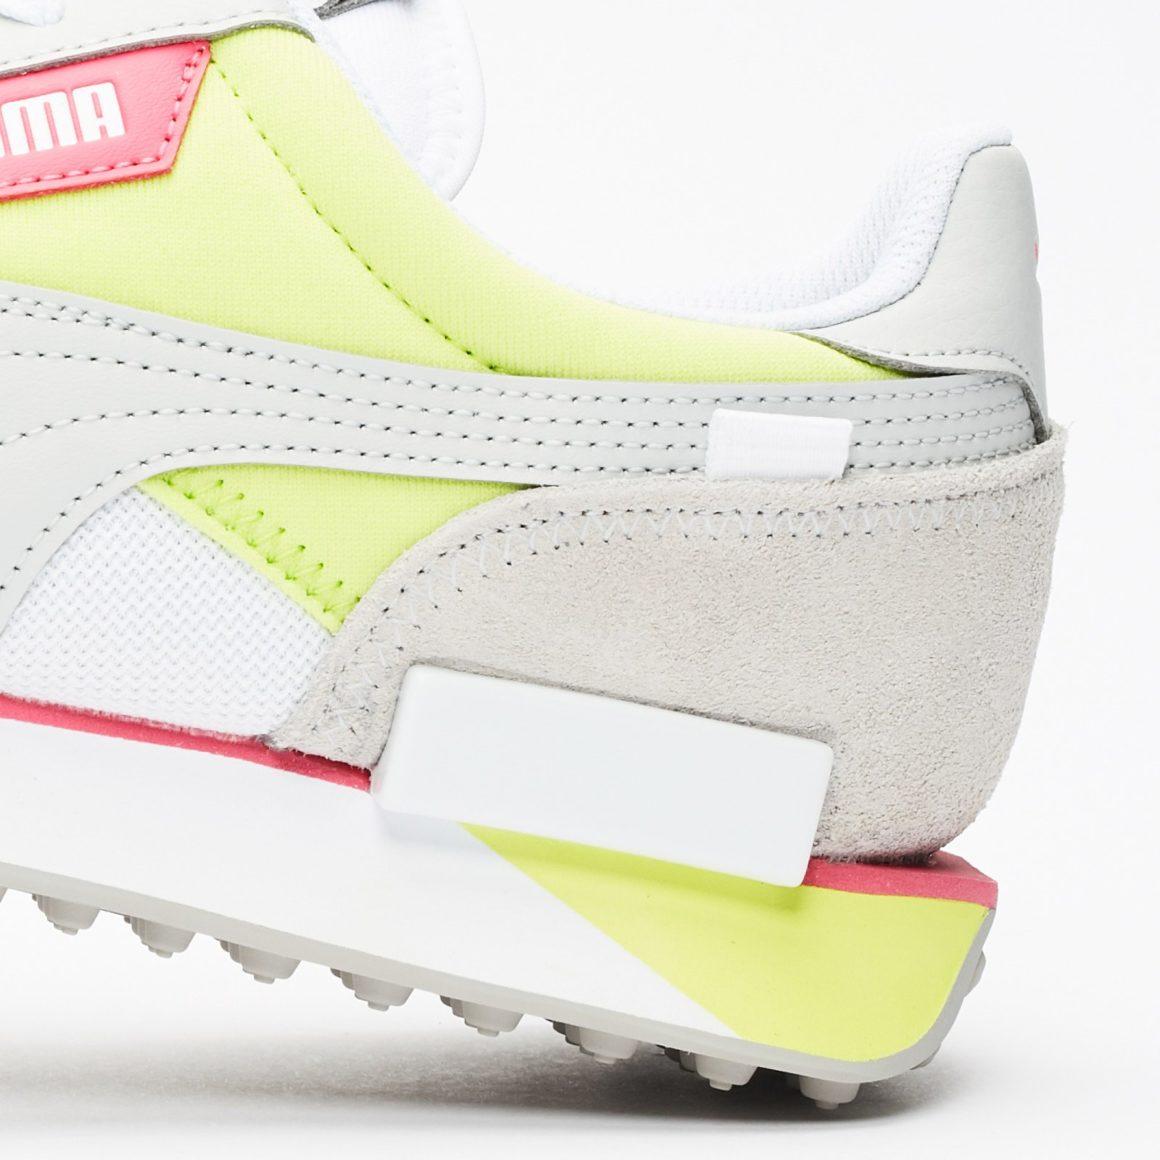 puma-future-rider-neon-play-373383-05-sommerschuhe-damen-2020